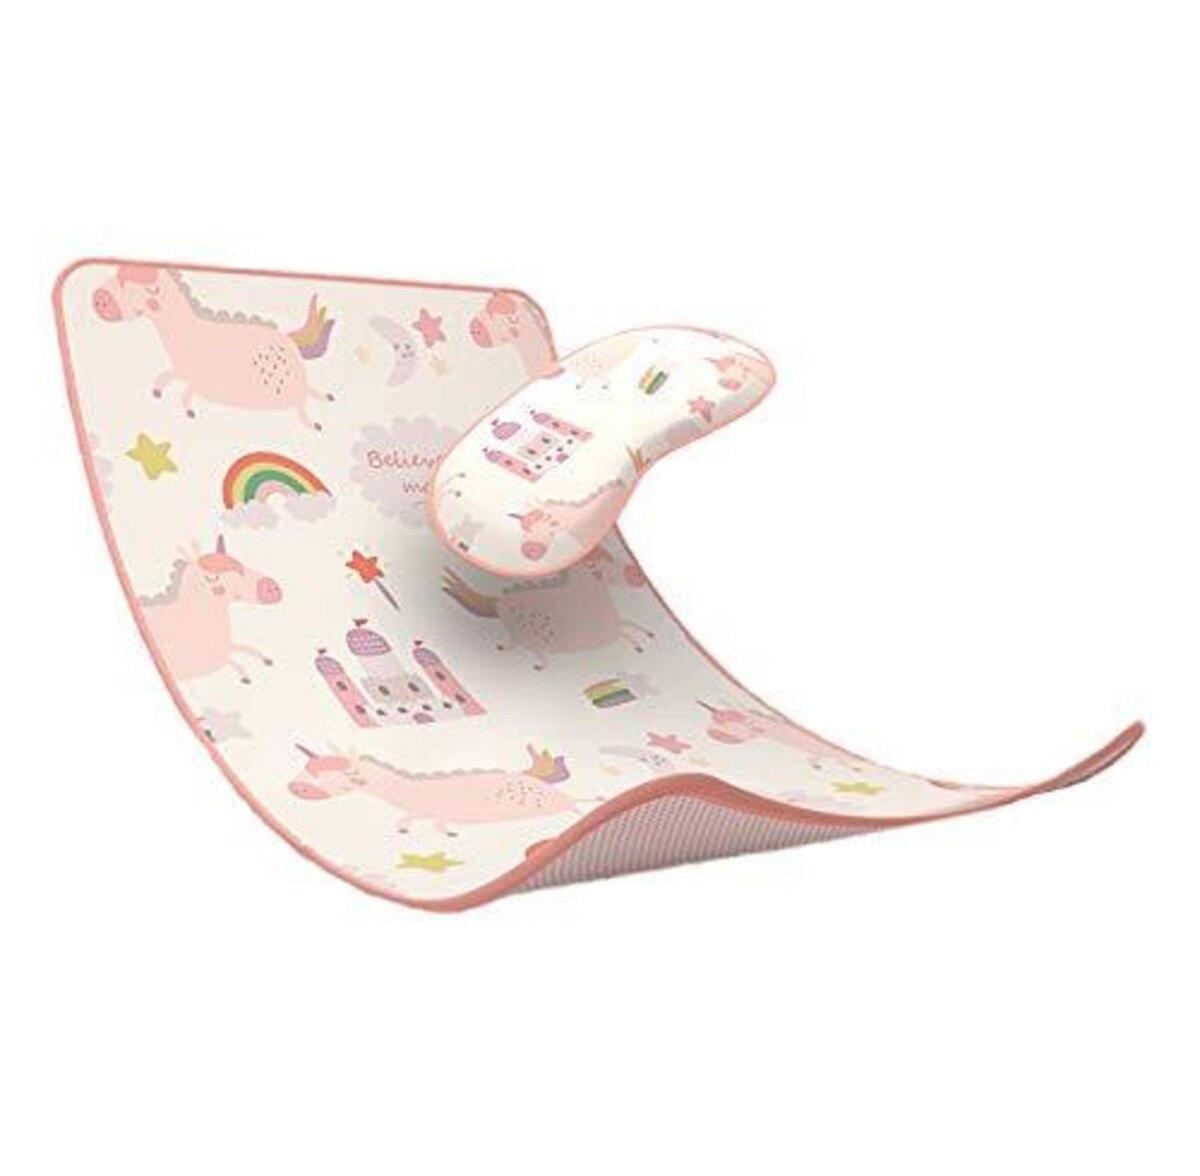 Mare GooDs 赤ちゃん ベビー ひんやり 枕 シート セット